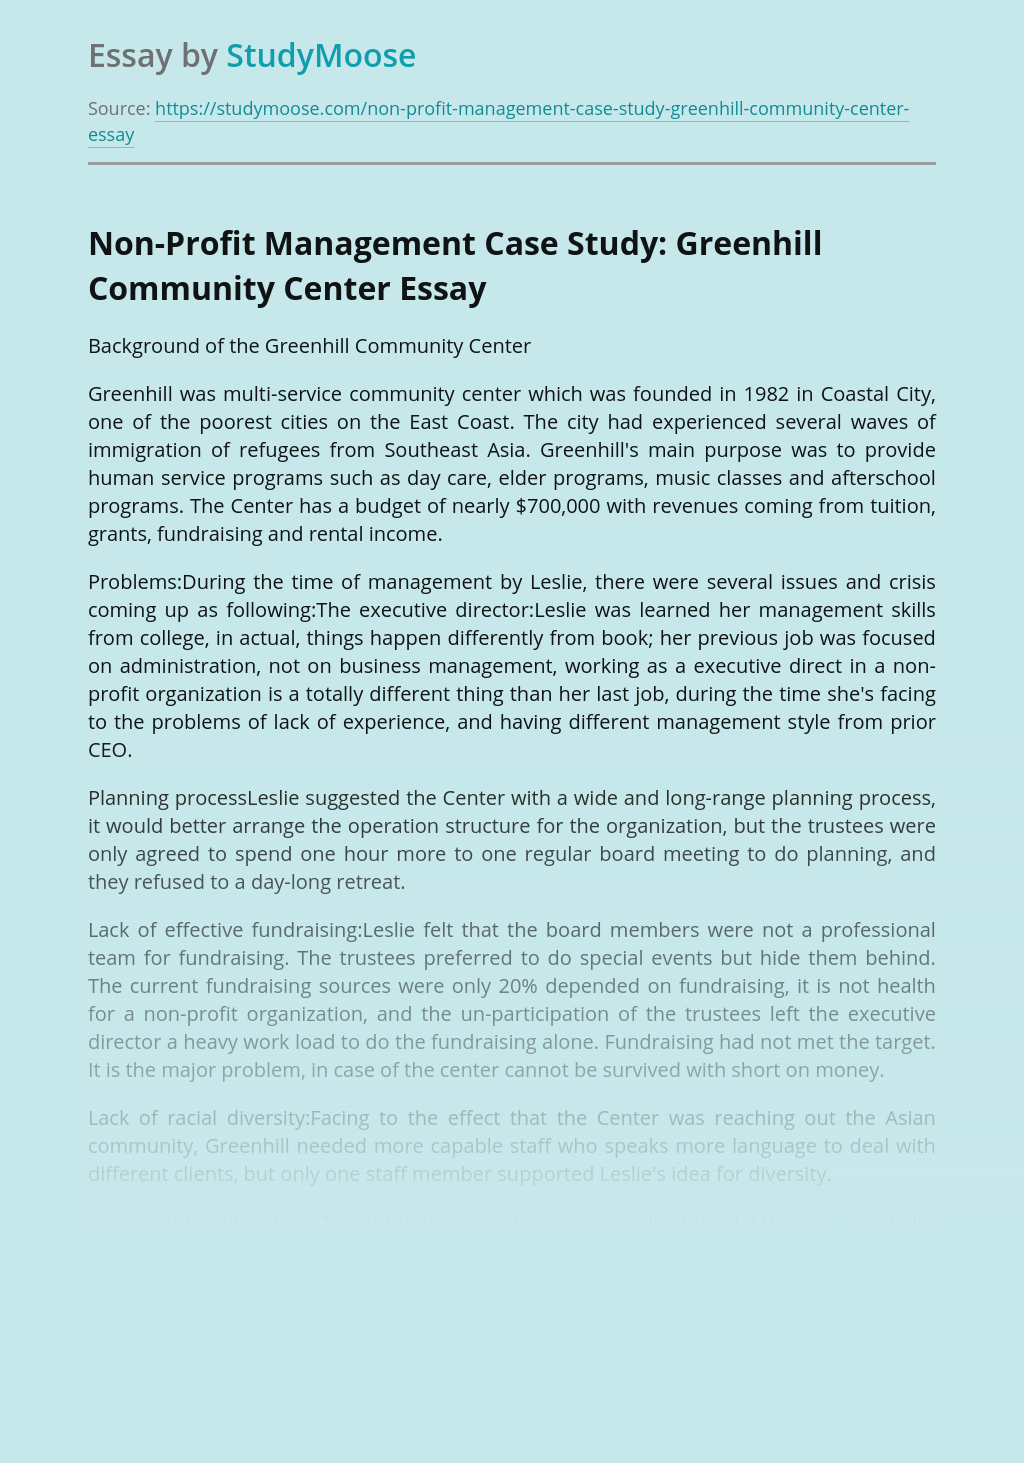 Non-Profit Management Case Study: Greenhill Community Center